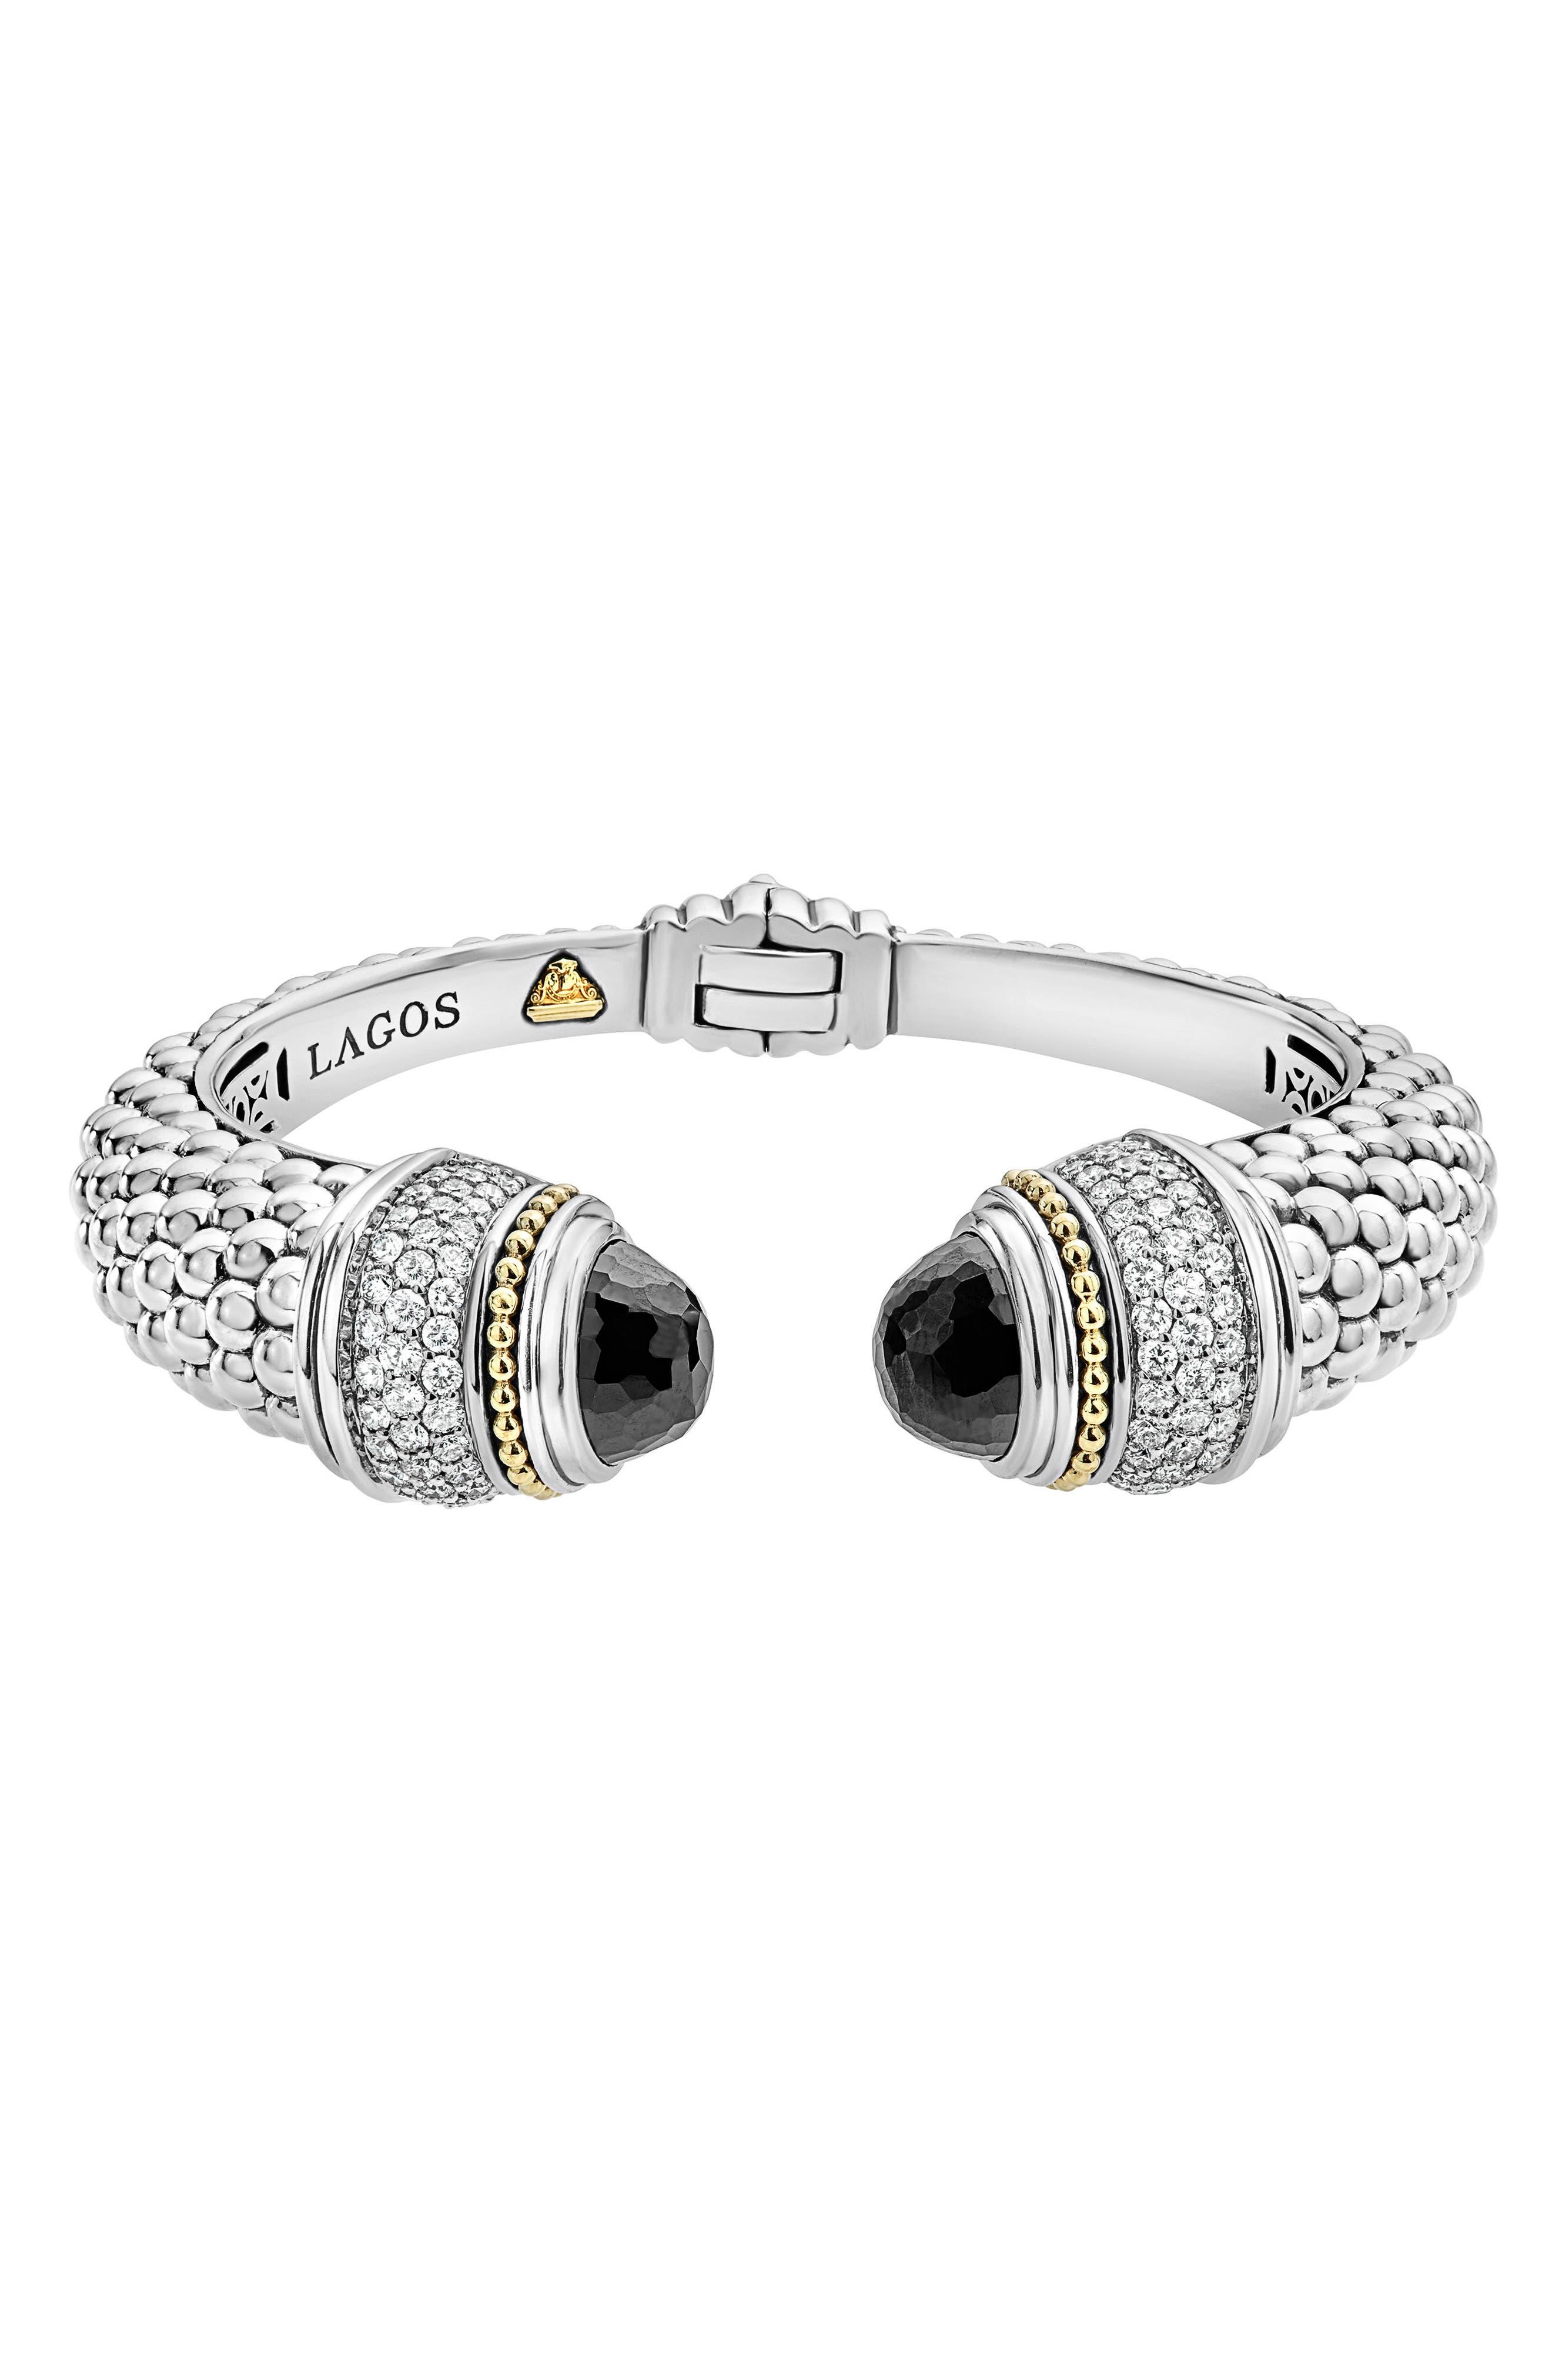 Caviar Diamond & Semiprecious Stone Wrist Cuff,                             Main thumbnail 1, color,                             BLACK SPINEL